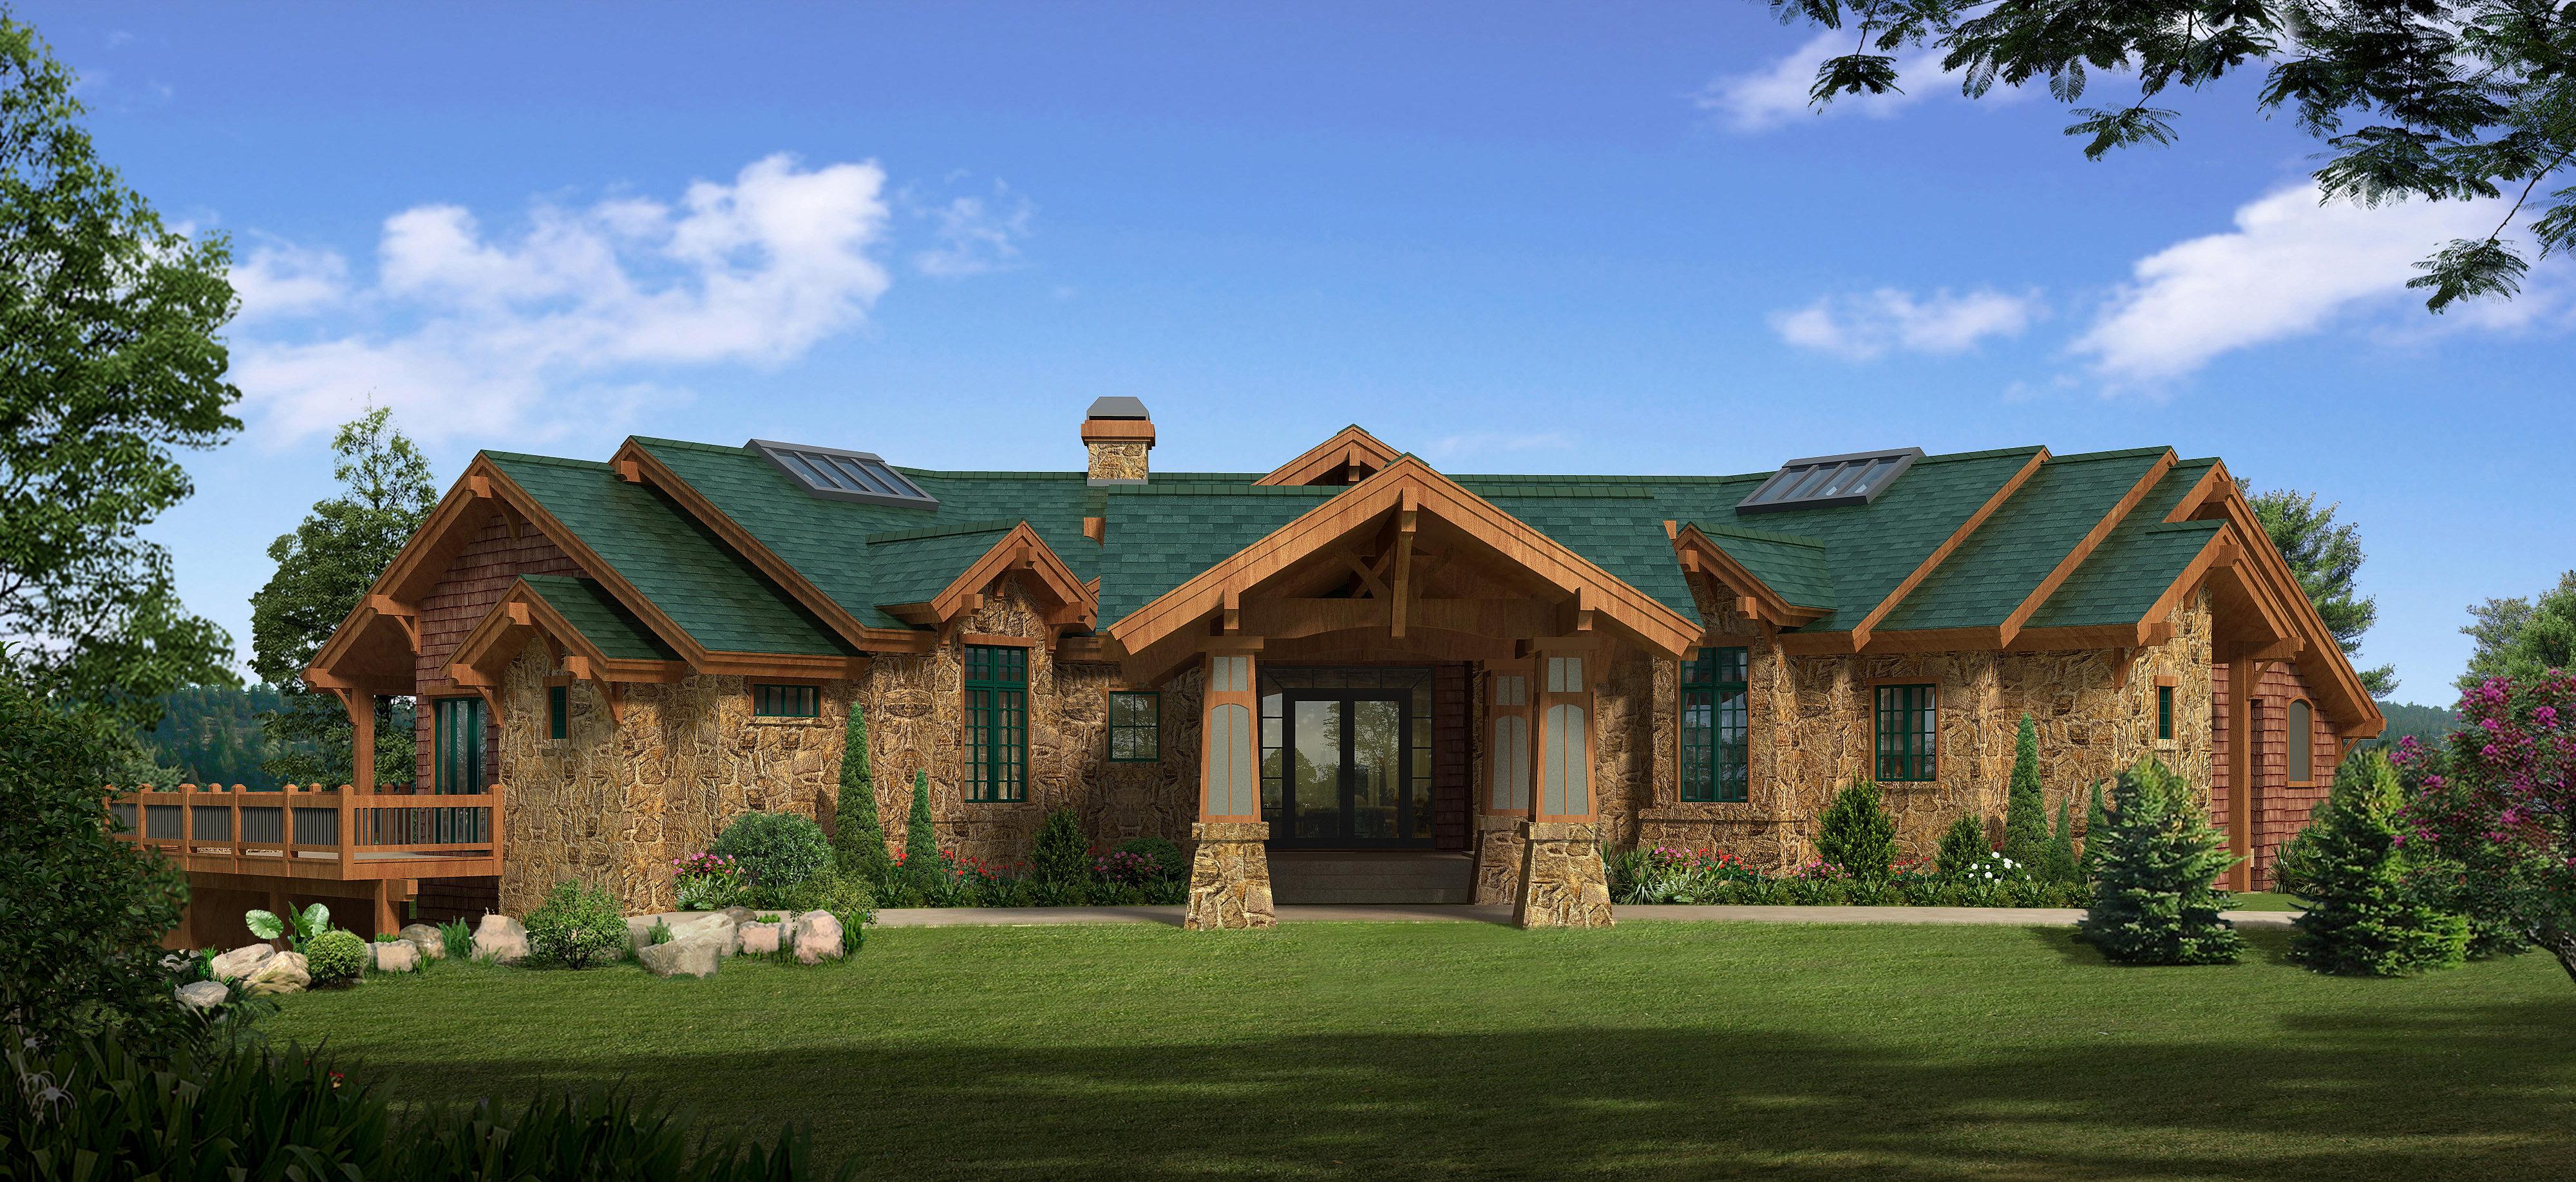 Mackprang design home design central oregon daylight for Daylight basement house plans designs